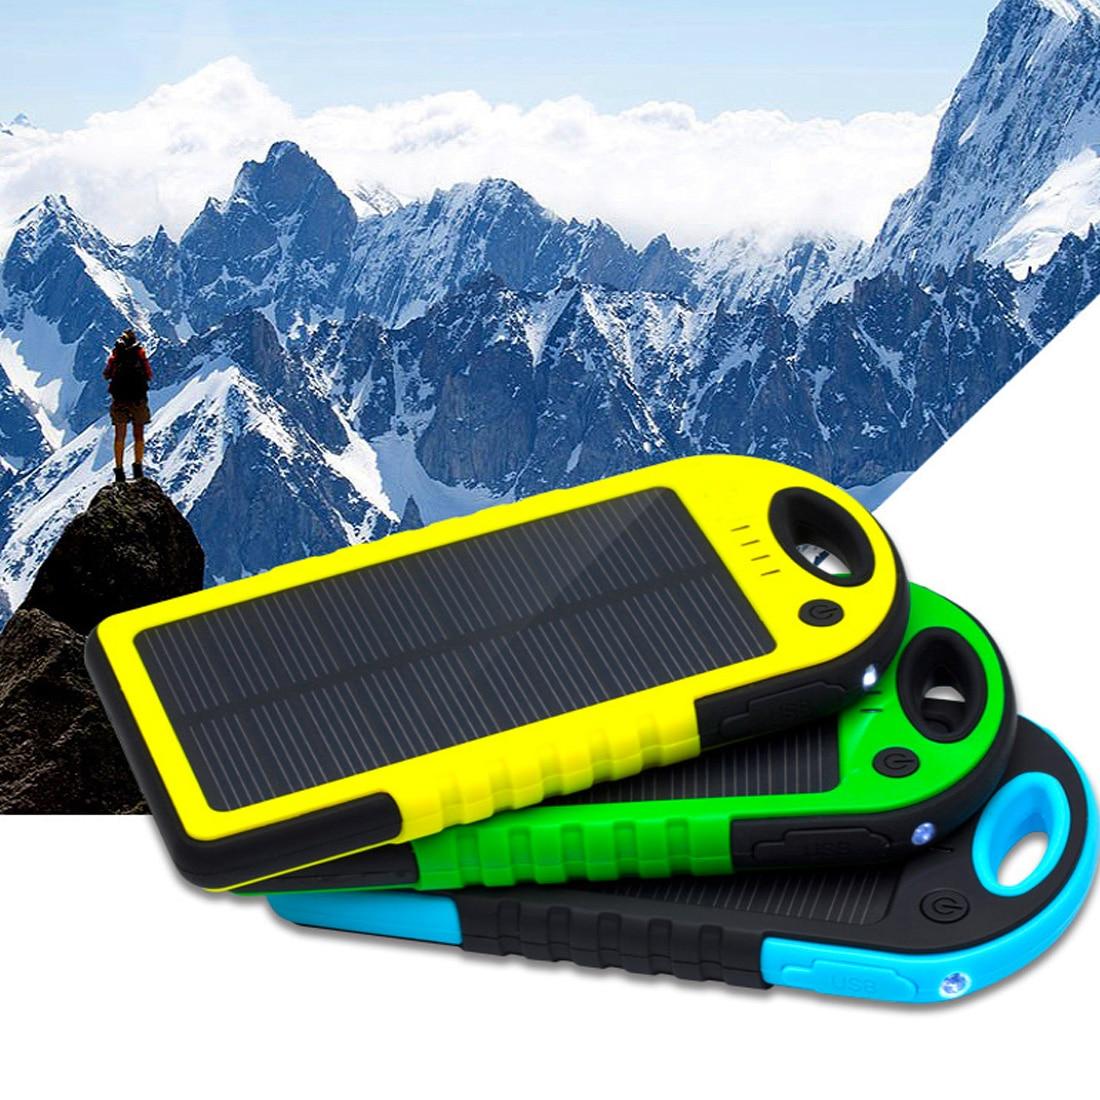 Solar Energy Power Bank Orange, 12000mah Transer DIY Portable 12000mAh Dual USB PowerCore Battery Waterproof Box Case with LED Light